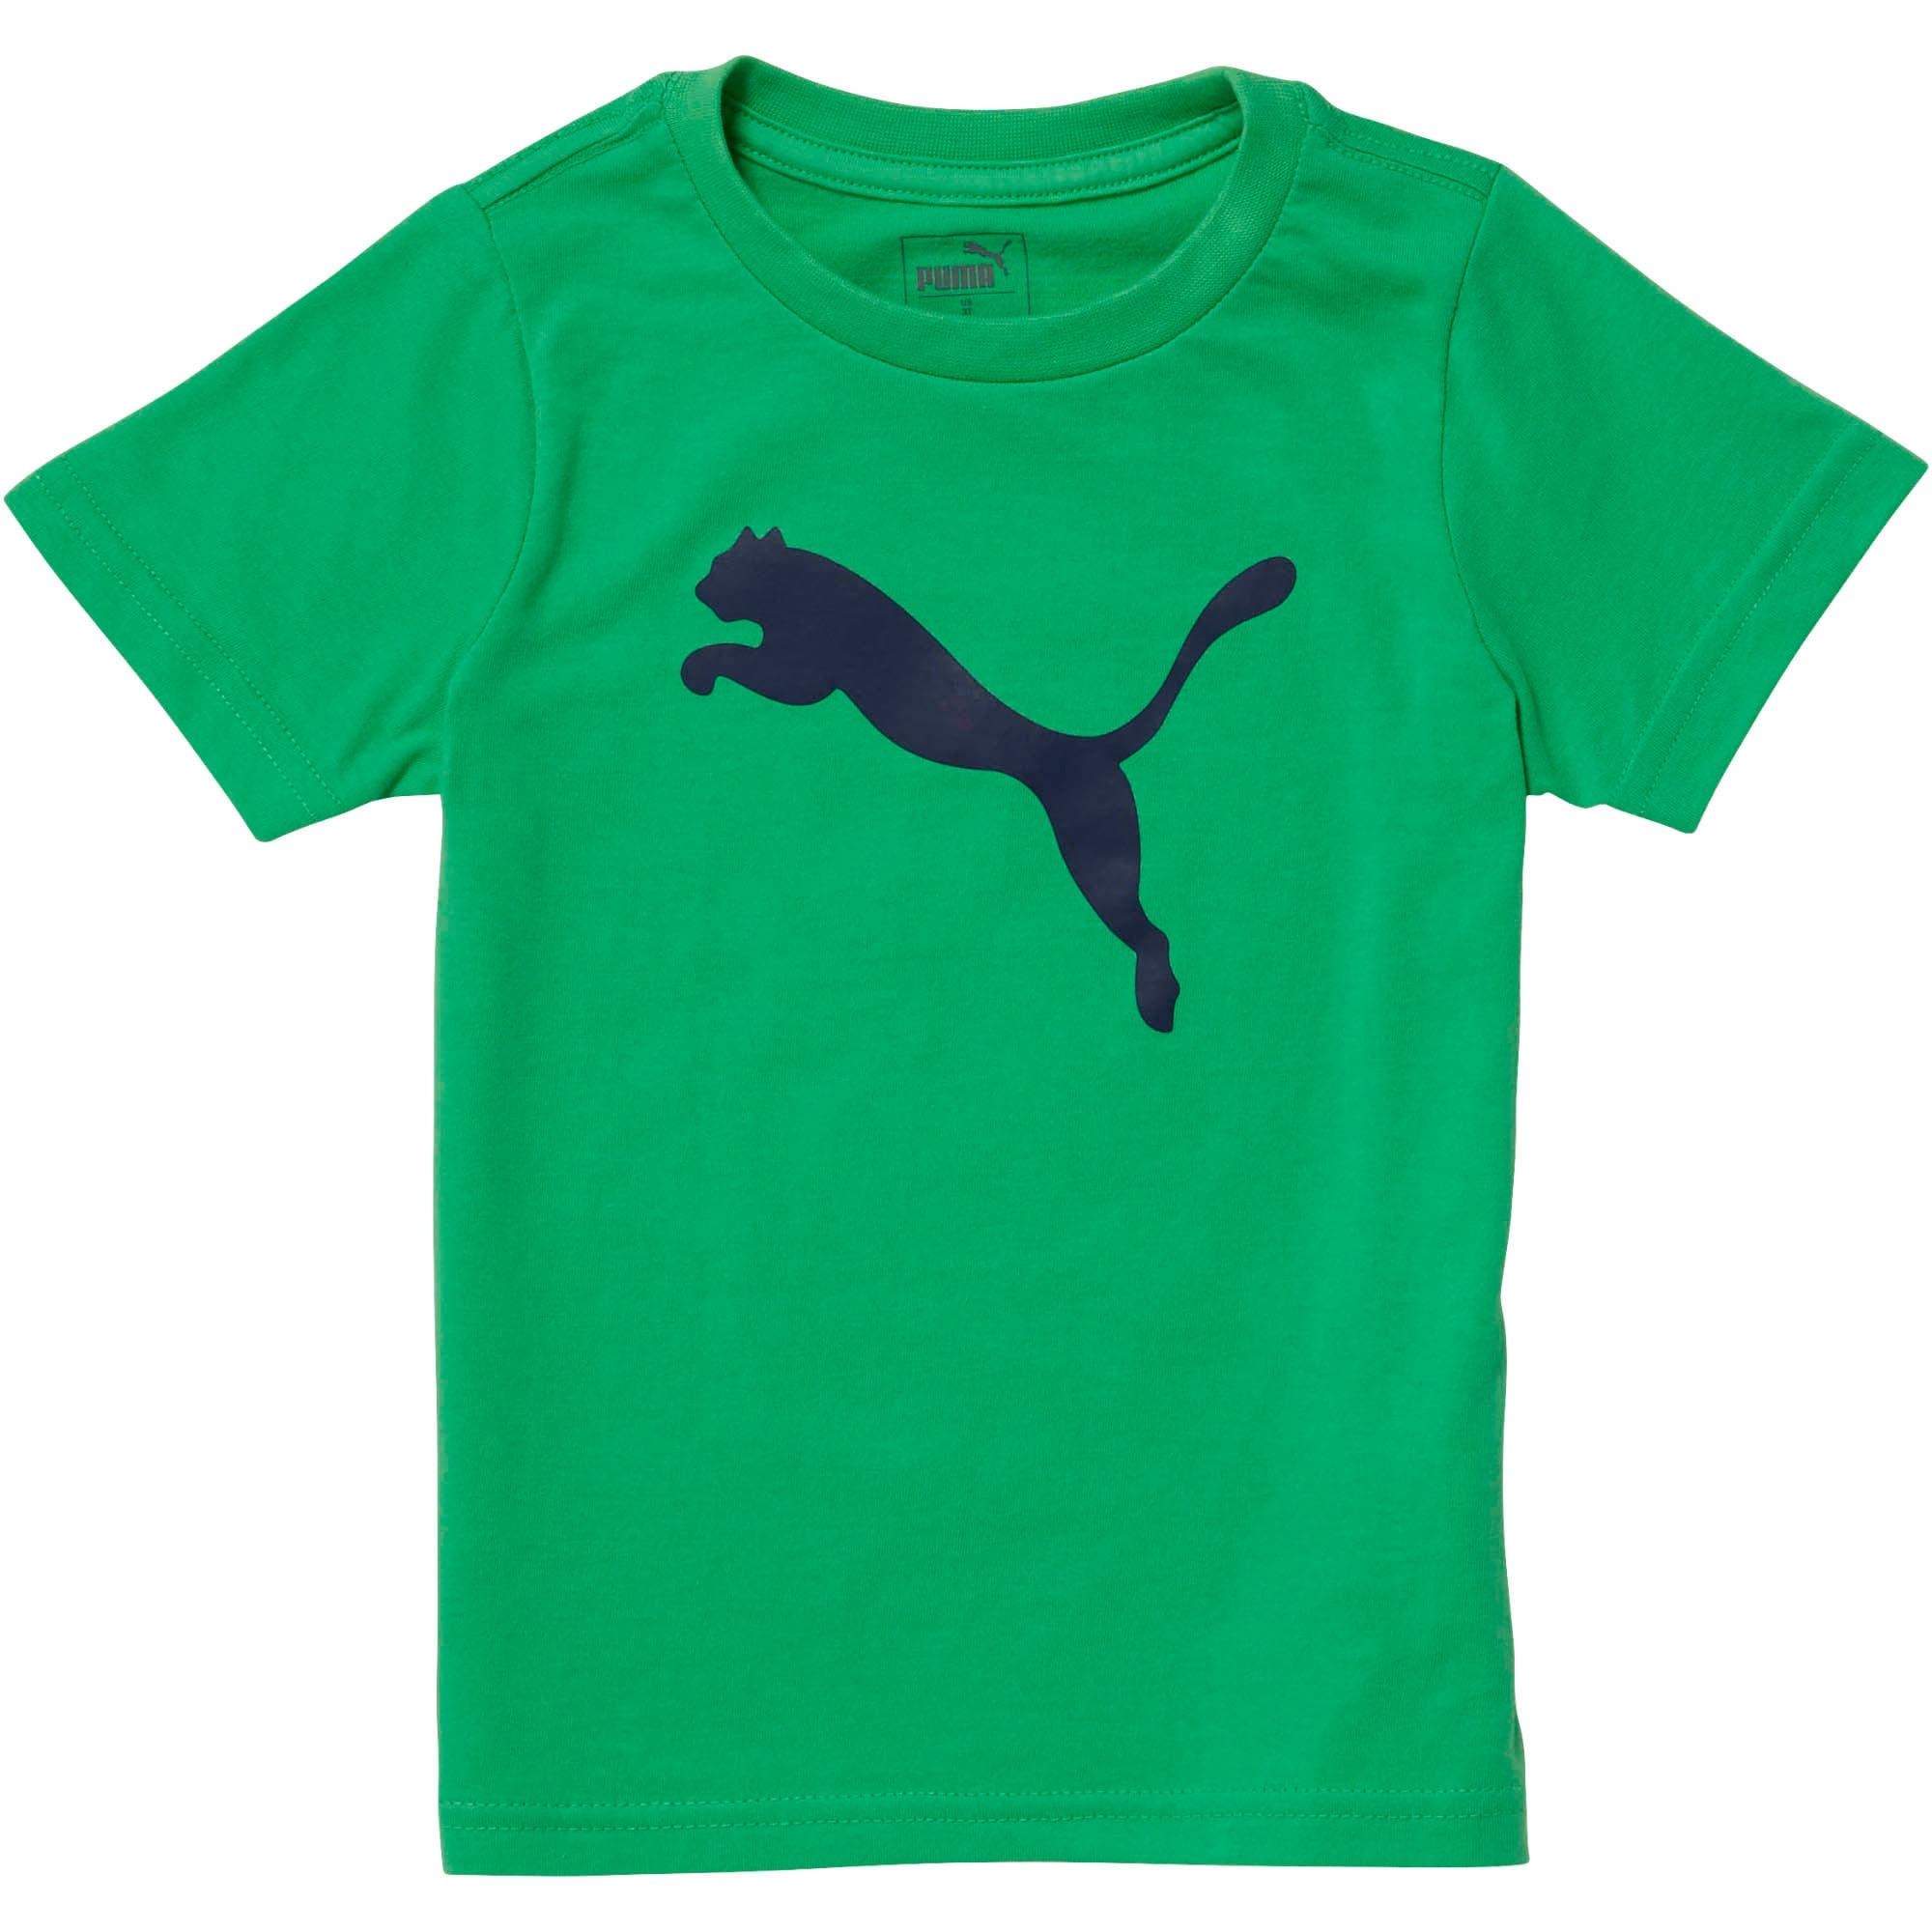 Miniatura 1 de Camiseta de jersey de algodón Heather para bebés, IRISH GREEN, mediano